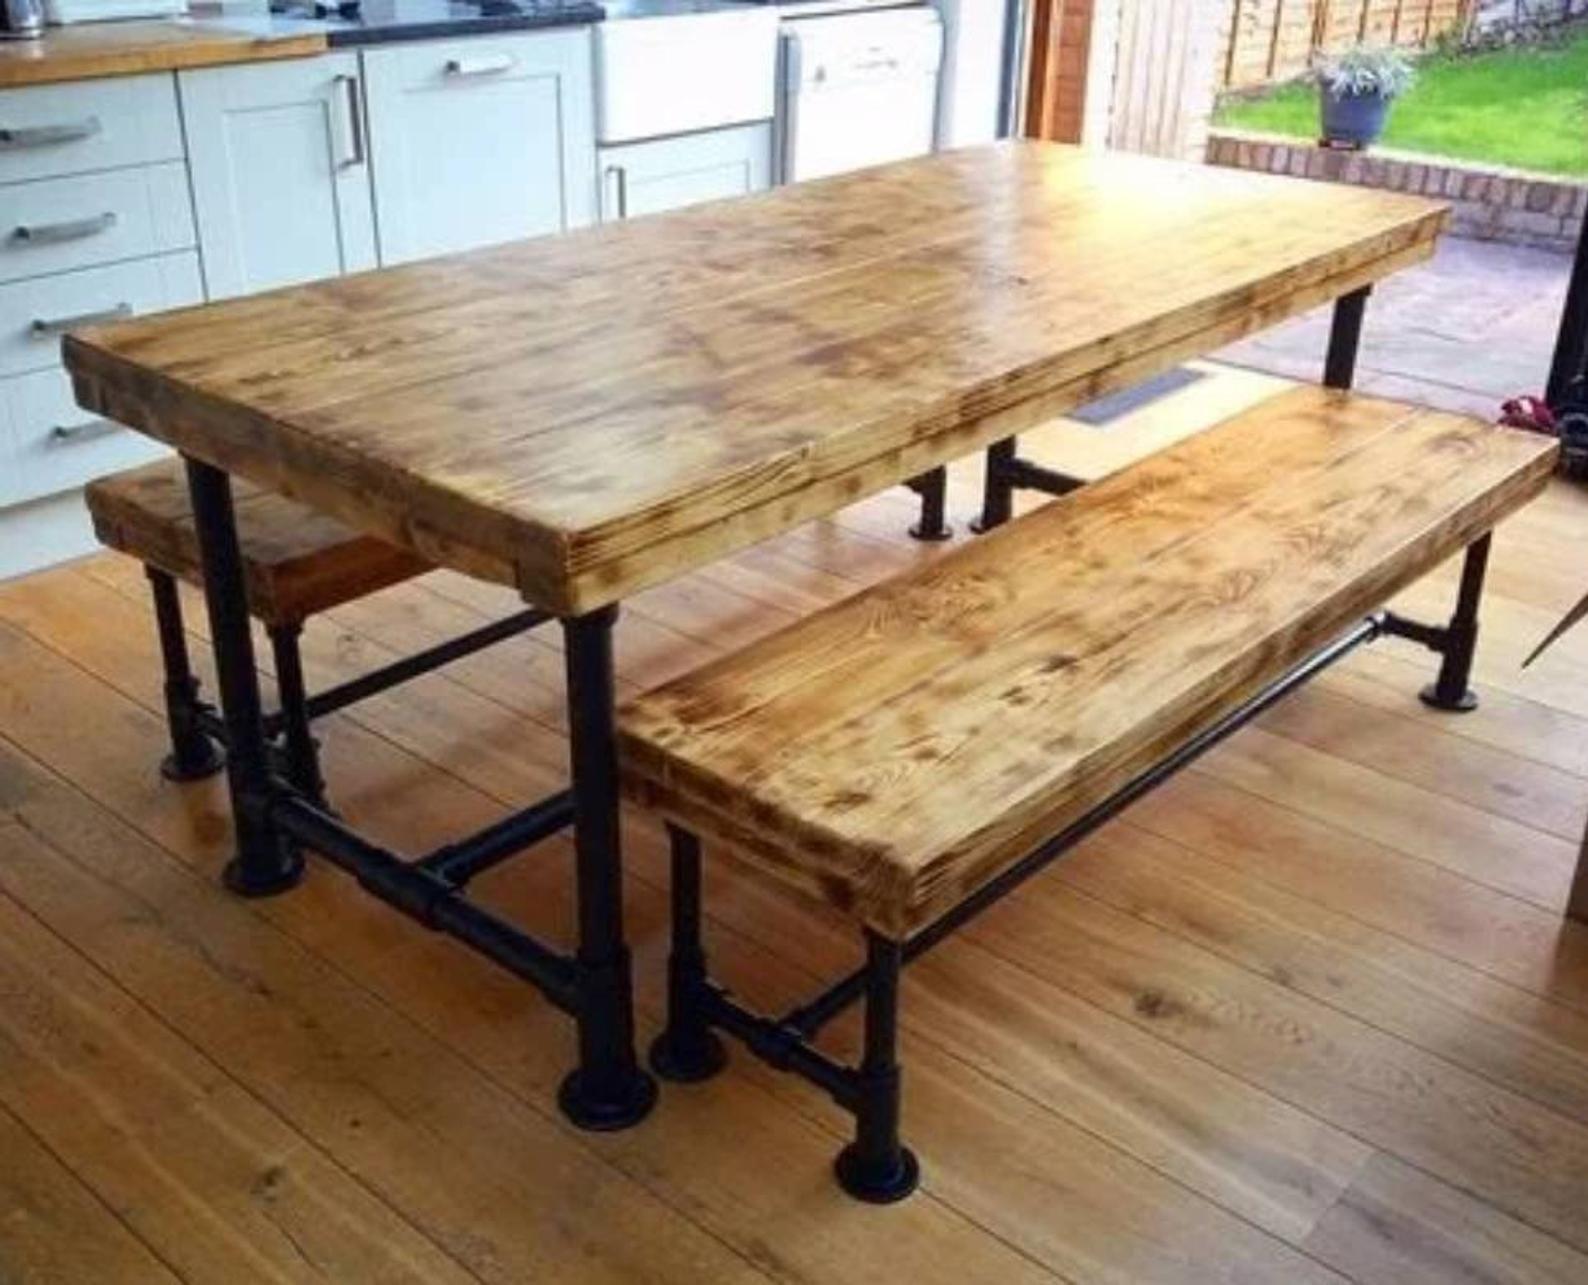 Table Banc De Cuisine dining table and benches | tables de cuisine rustique, table